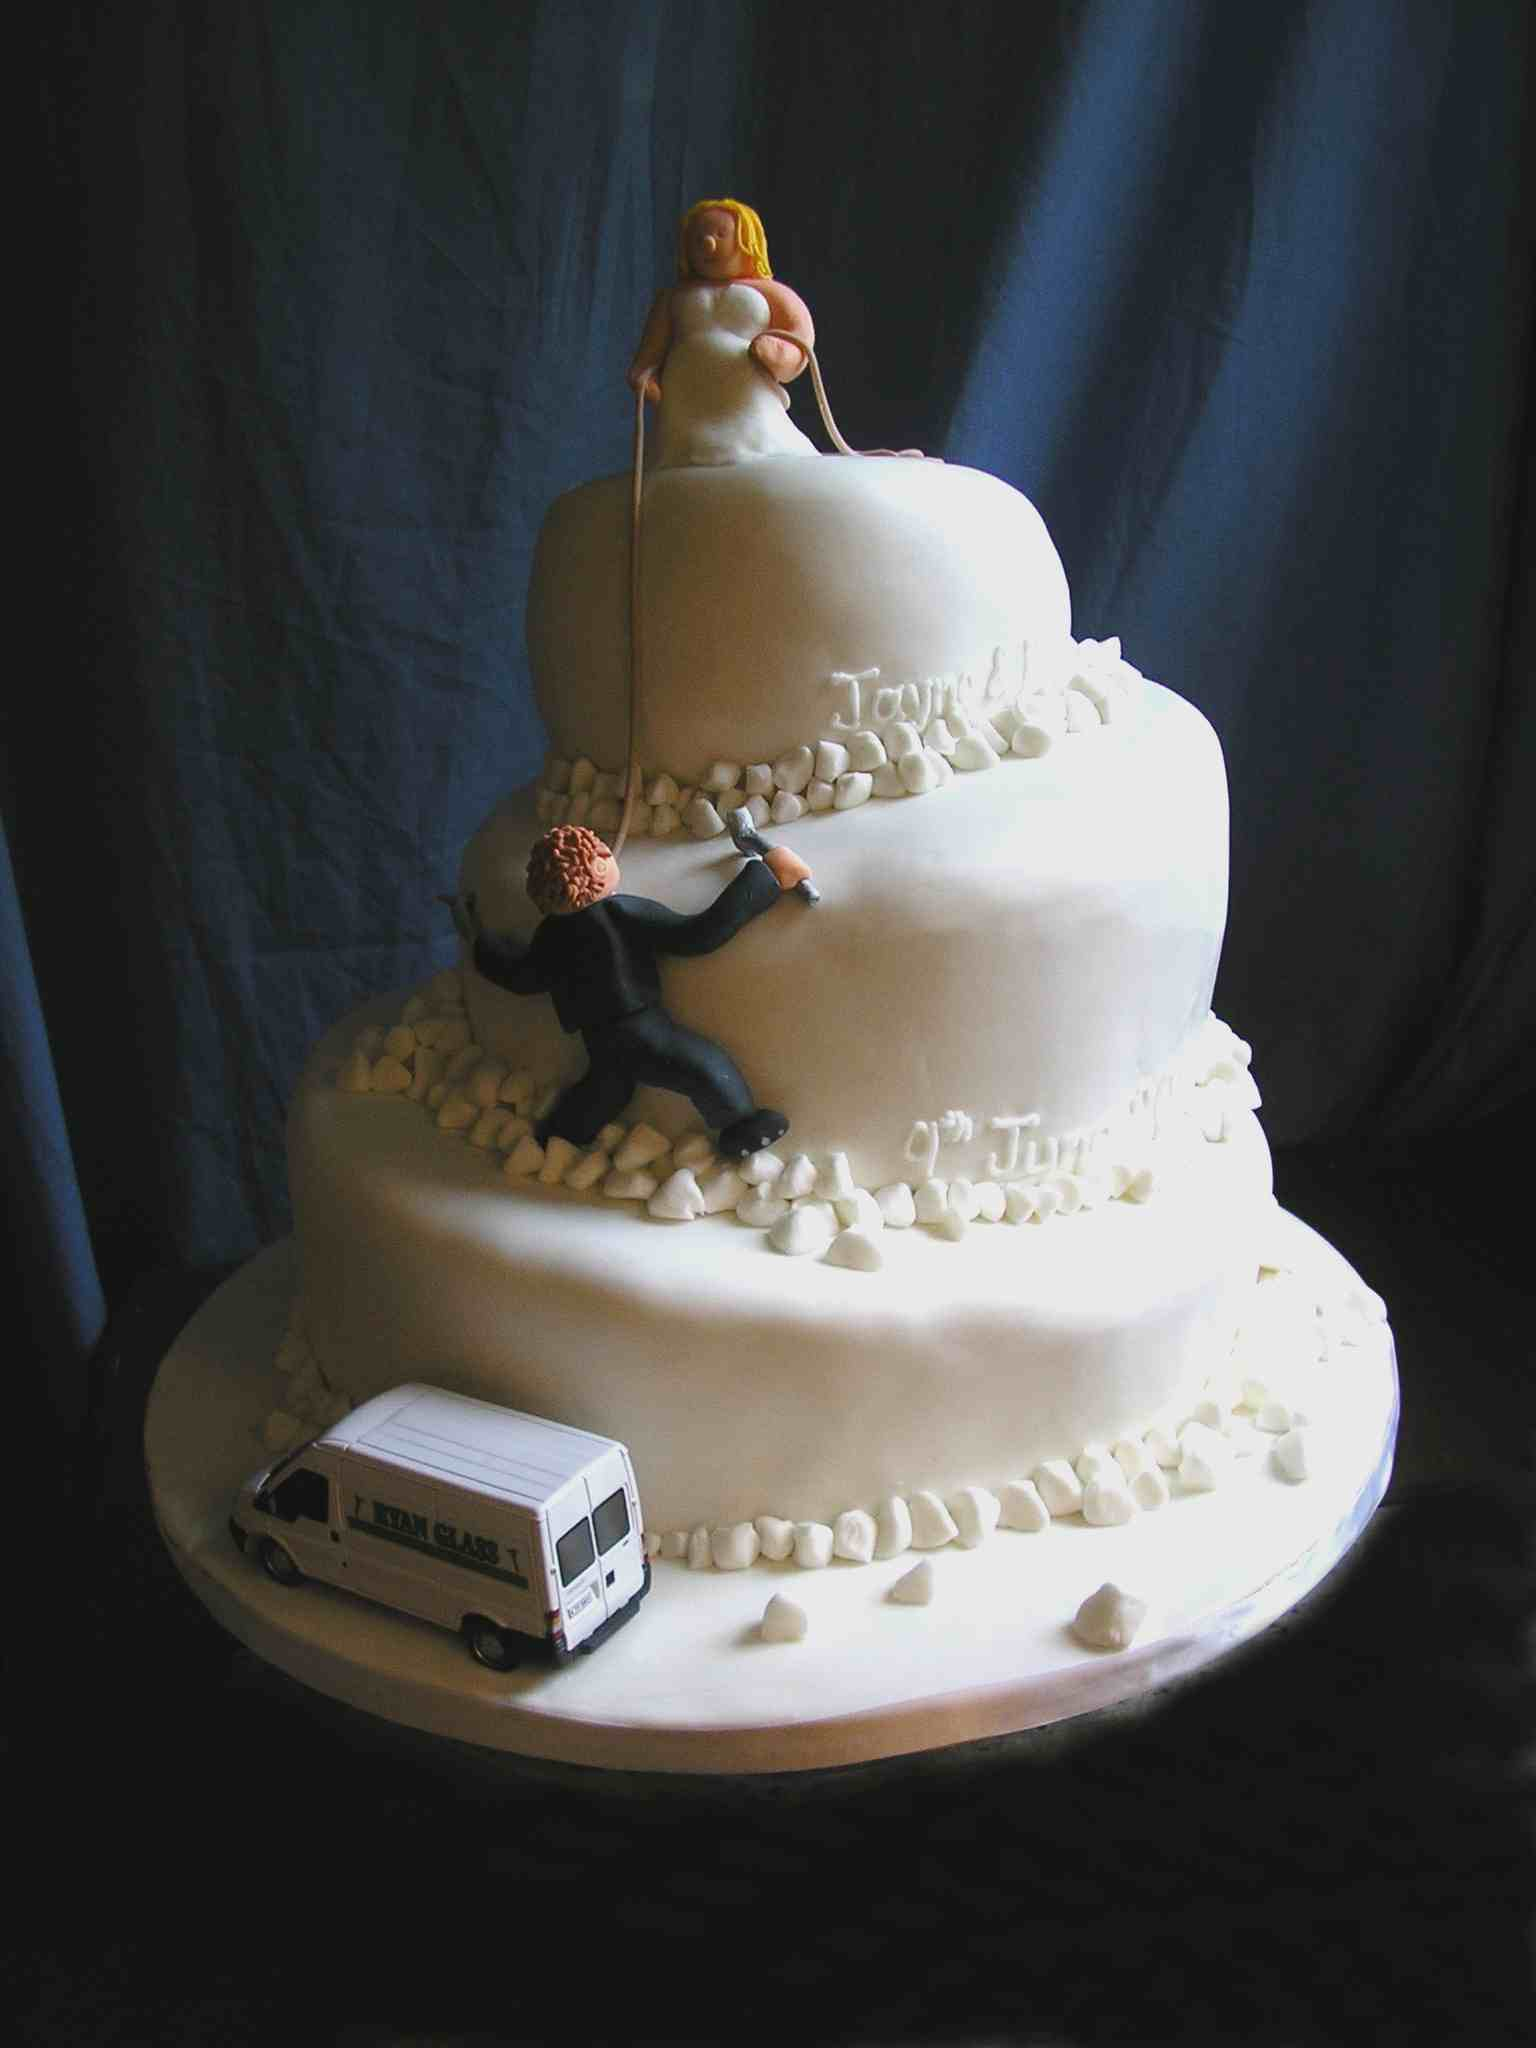 Ice Climbers' Wedding Cake